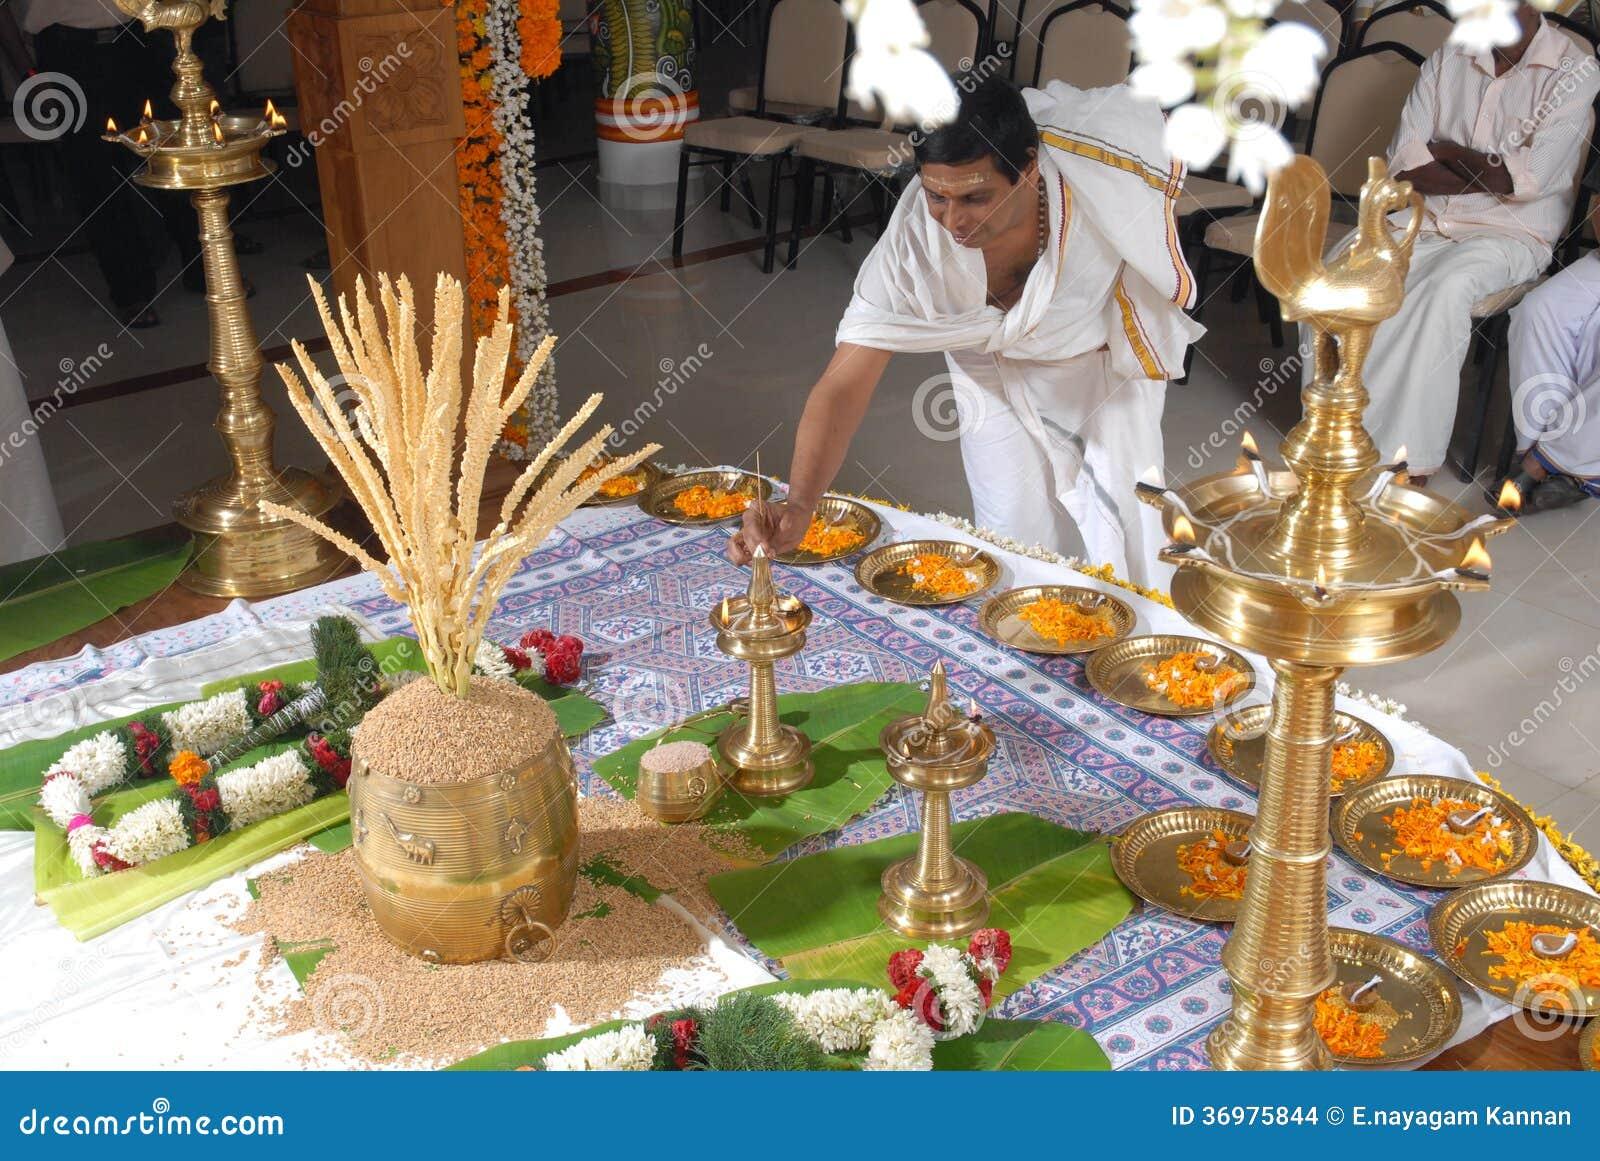 Indian Ethnic Home Decor Ideas A Kerala Wedding Flower Decoration Editorial Stock Image